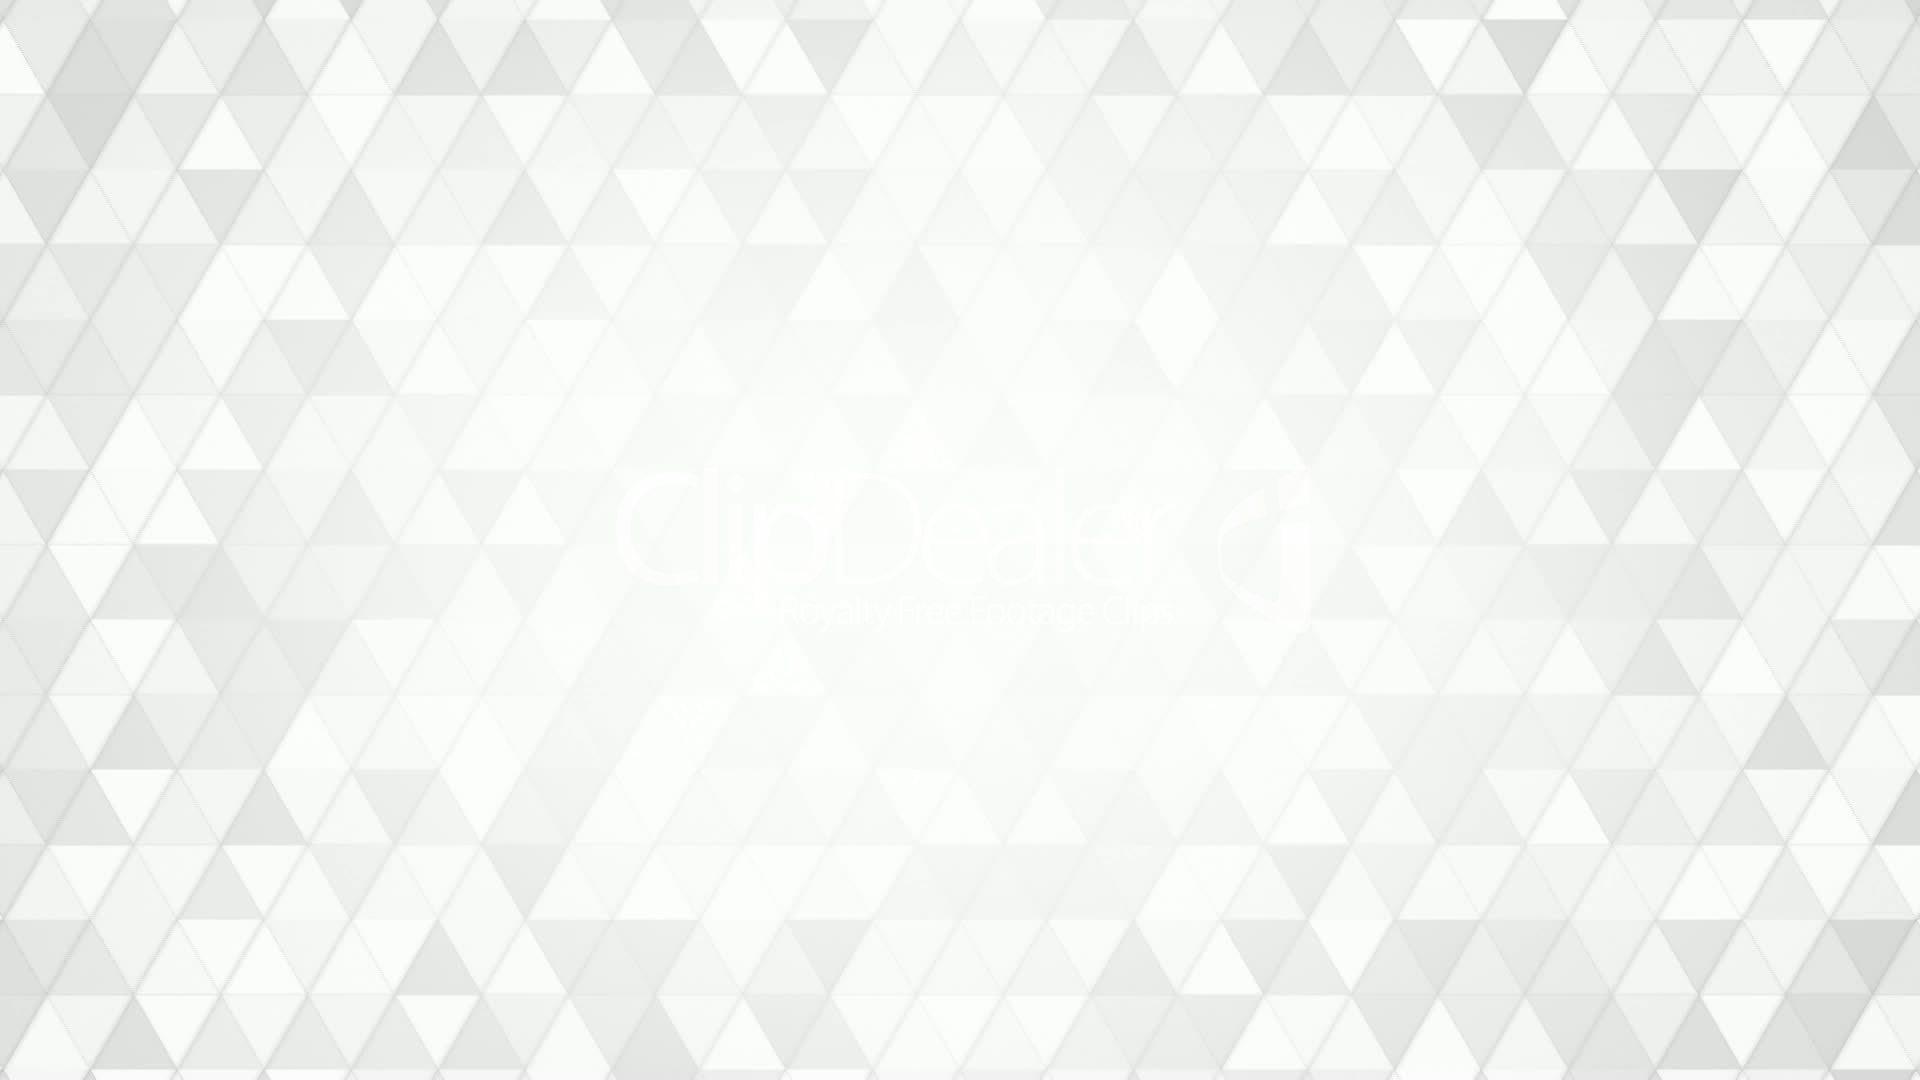 Triangle Wallpaper White | www.pixshark.com - Images ...